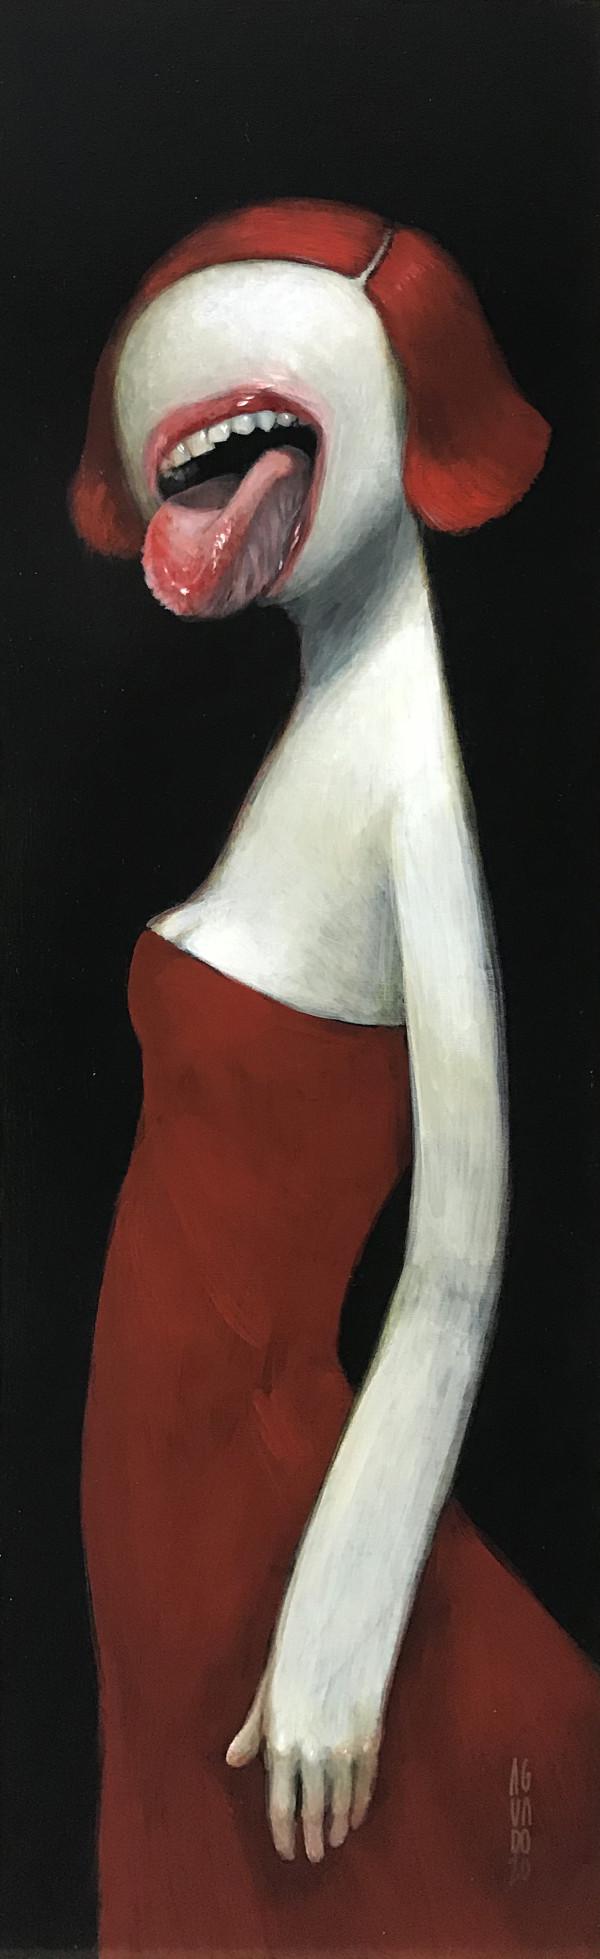 Tongue by Jesús Aguado